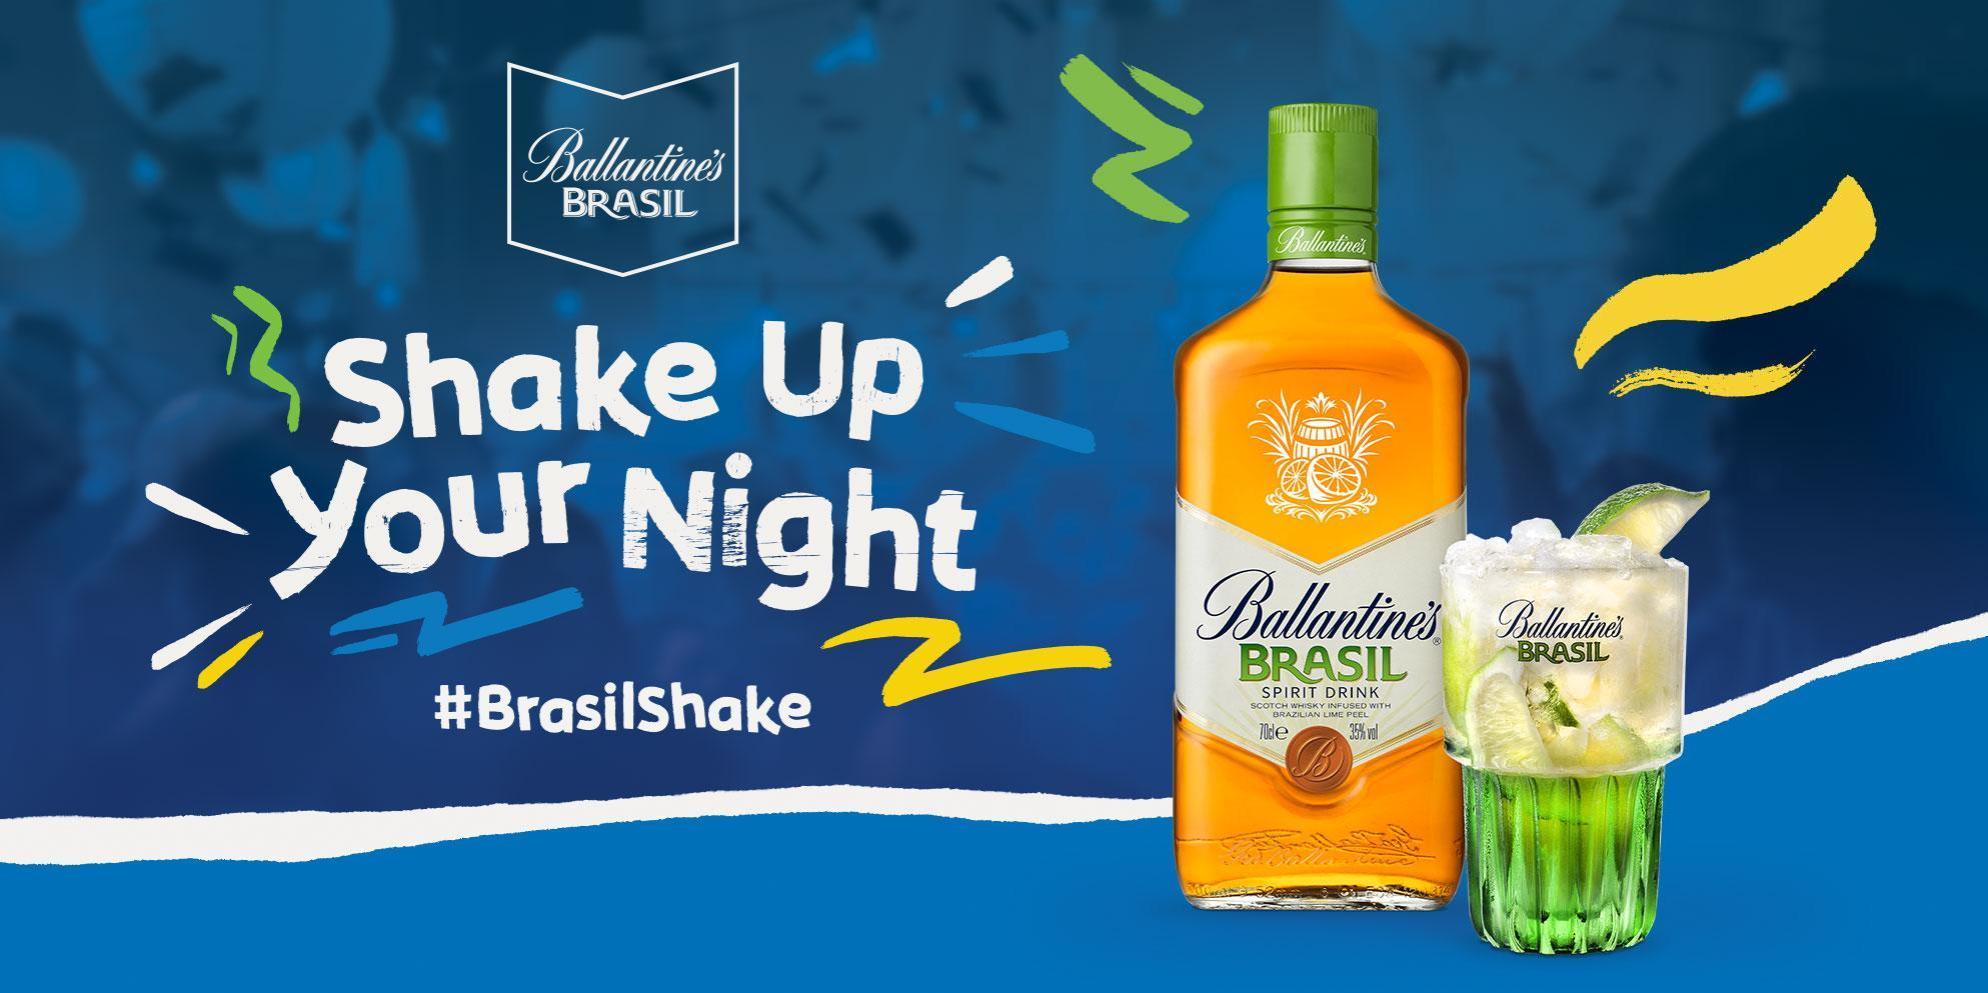 Ballantine's Scotch Whisky | Brasil Shake | Ballantine's Brasil